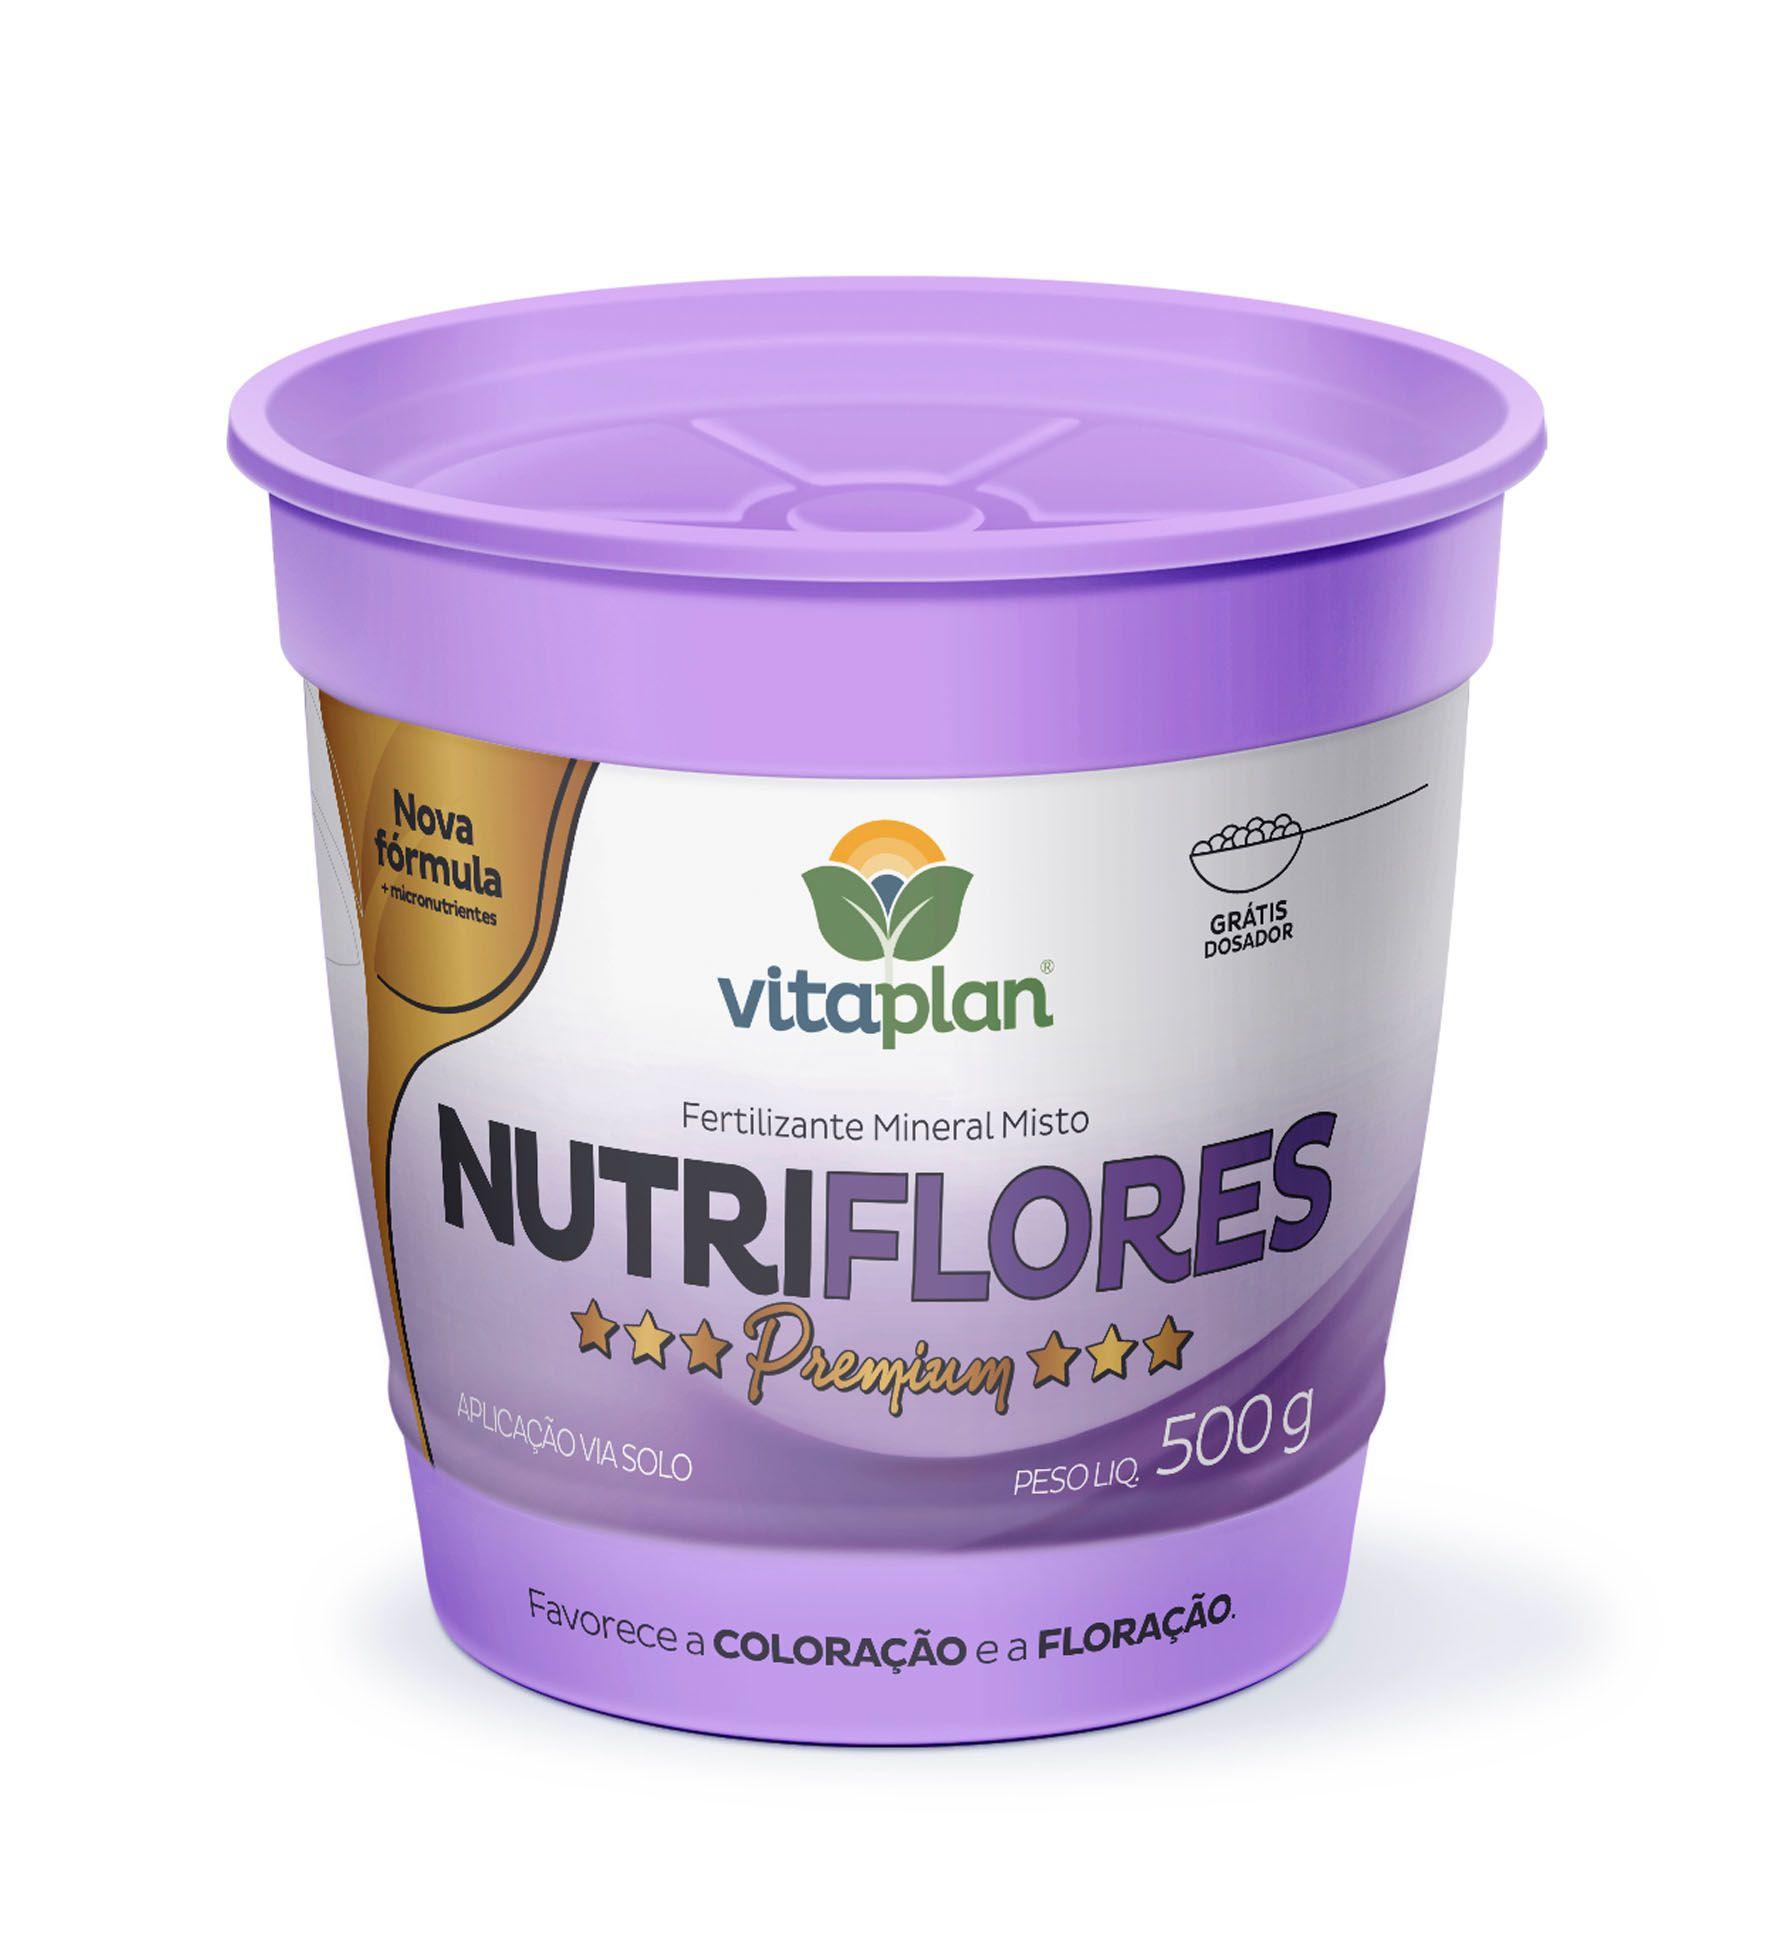 Fertilizante Mineral Misto Nutriflores 500g - Vitaplan